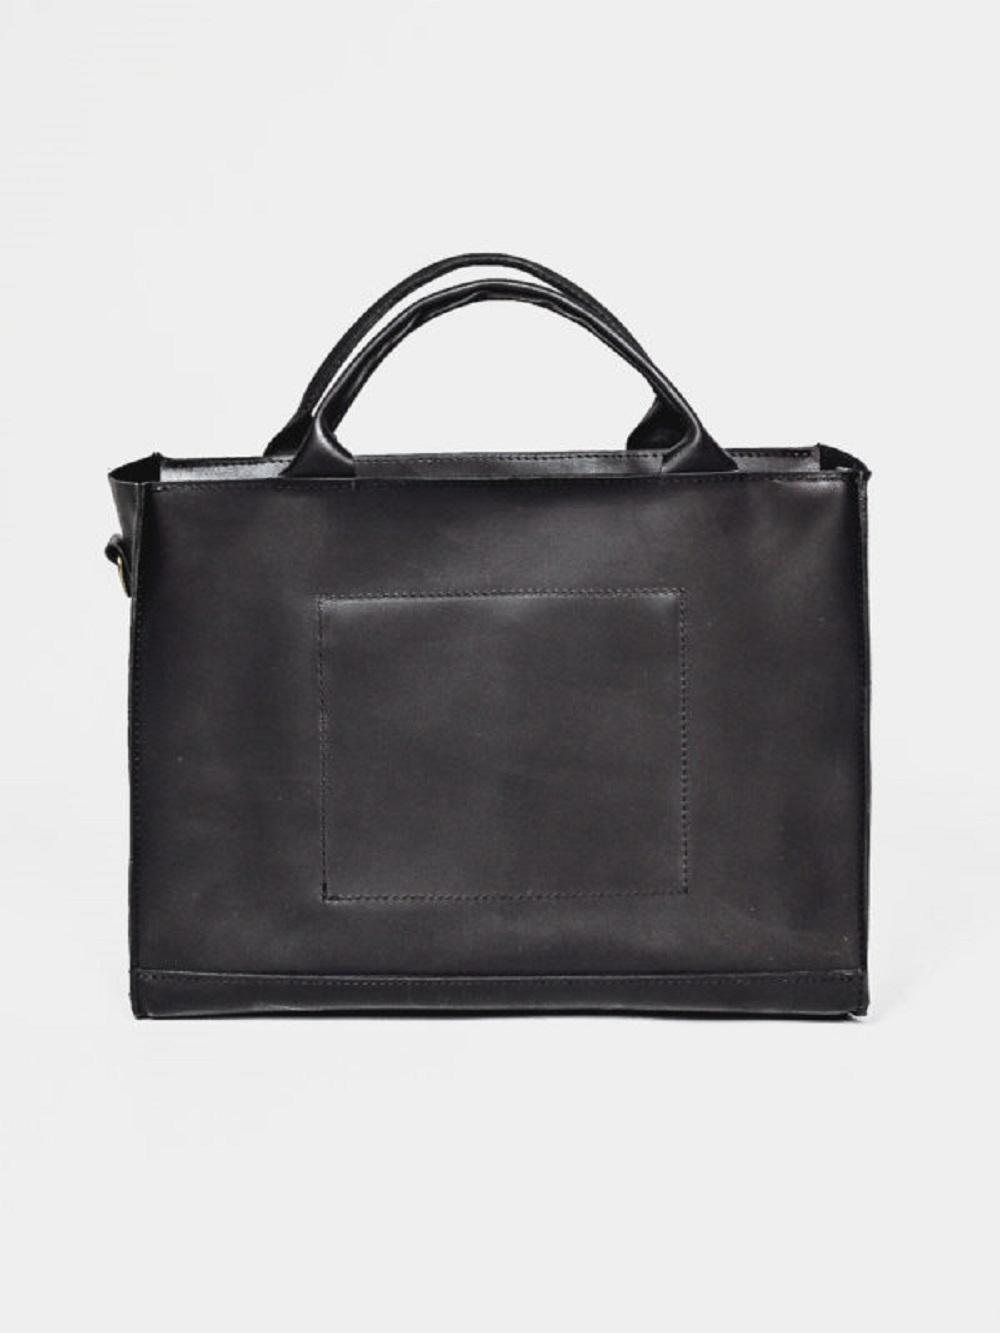 TORBA DAMSKA T01 DEEP BLACK - torebka damska na dokumenty - torebka czarna damska na laptopa - torebka damska na ramię -Lezerton